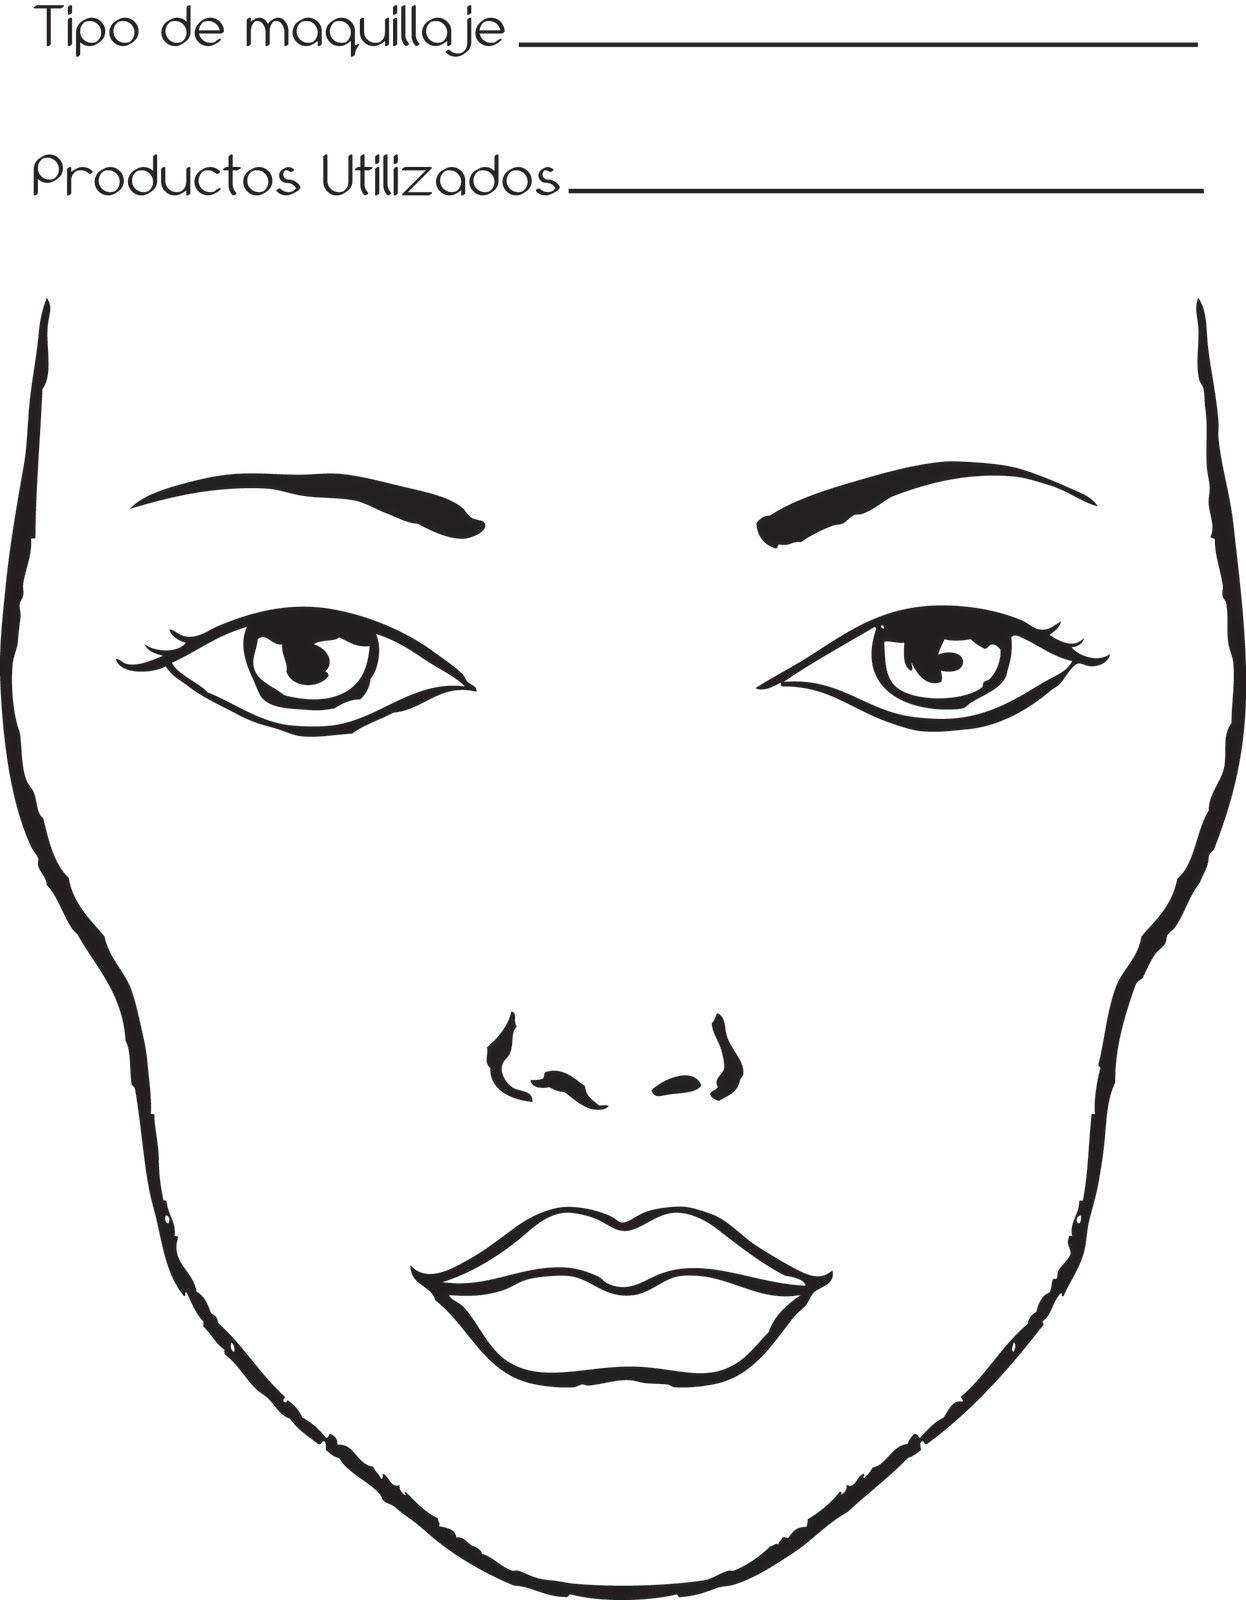 Dibujos De Caras Libros De Maquillaje Dibujos De Maquillaje Dibujos De Caras